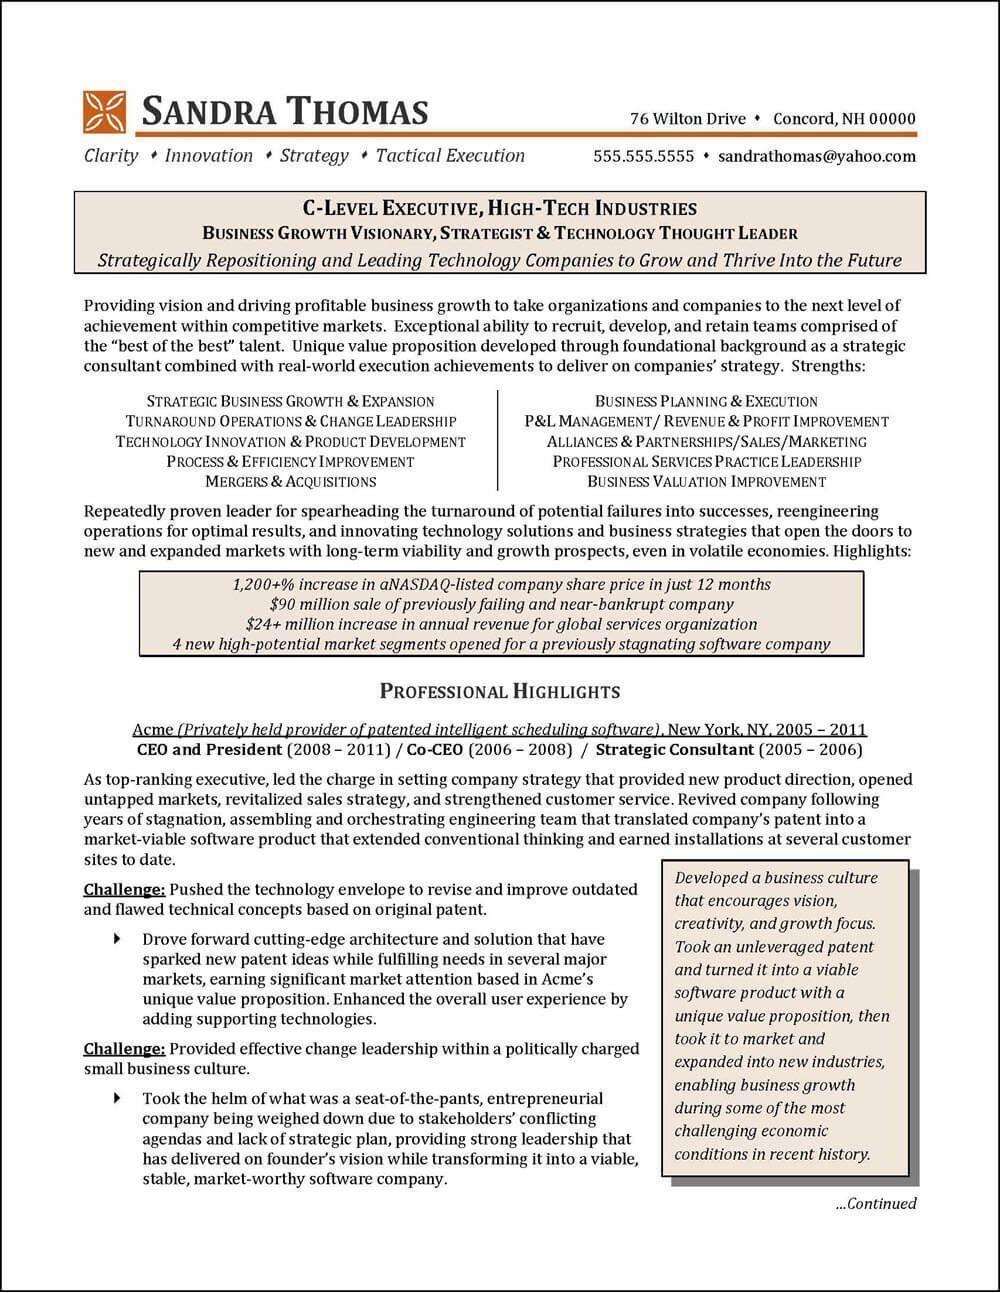 National award-winning executive resume examples, executive cover ...